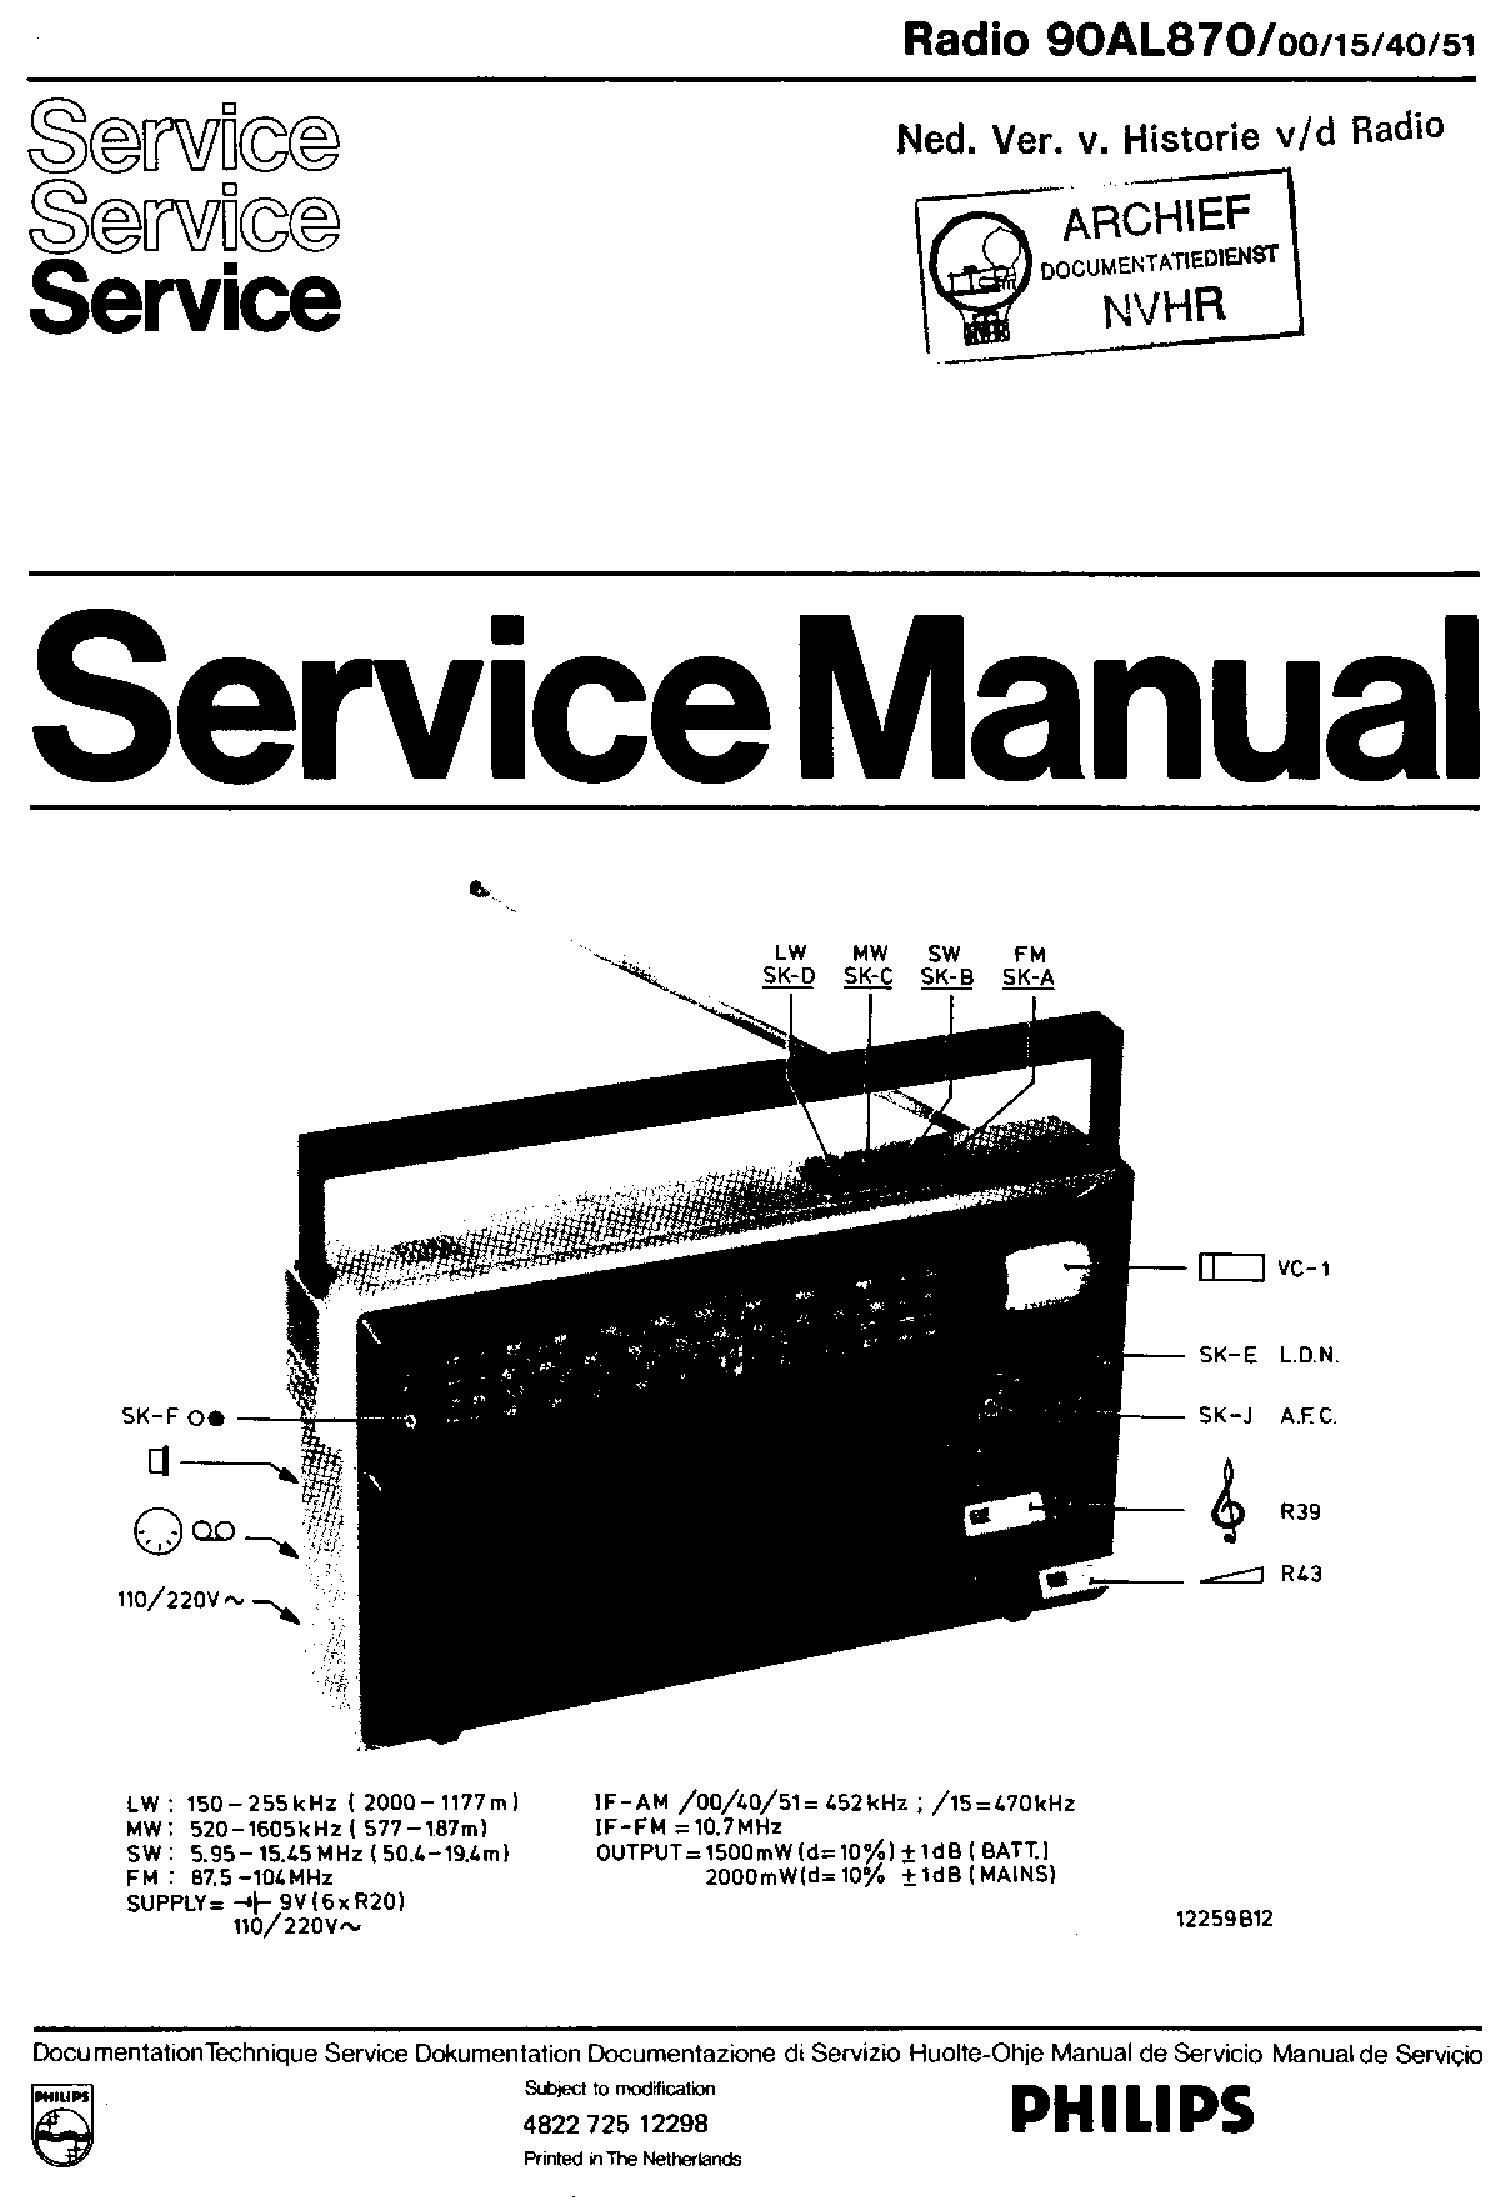 Philips 90al870